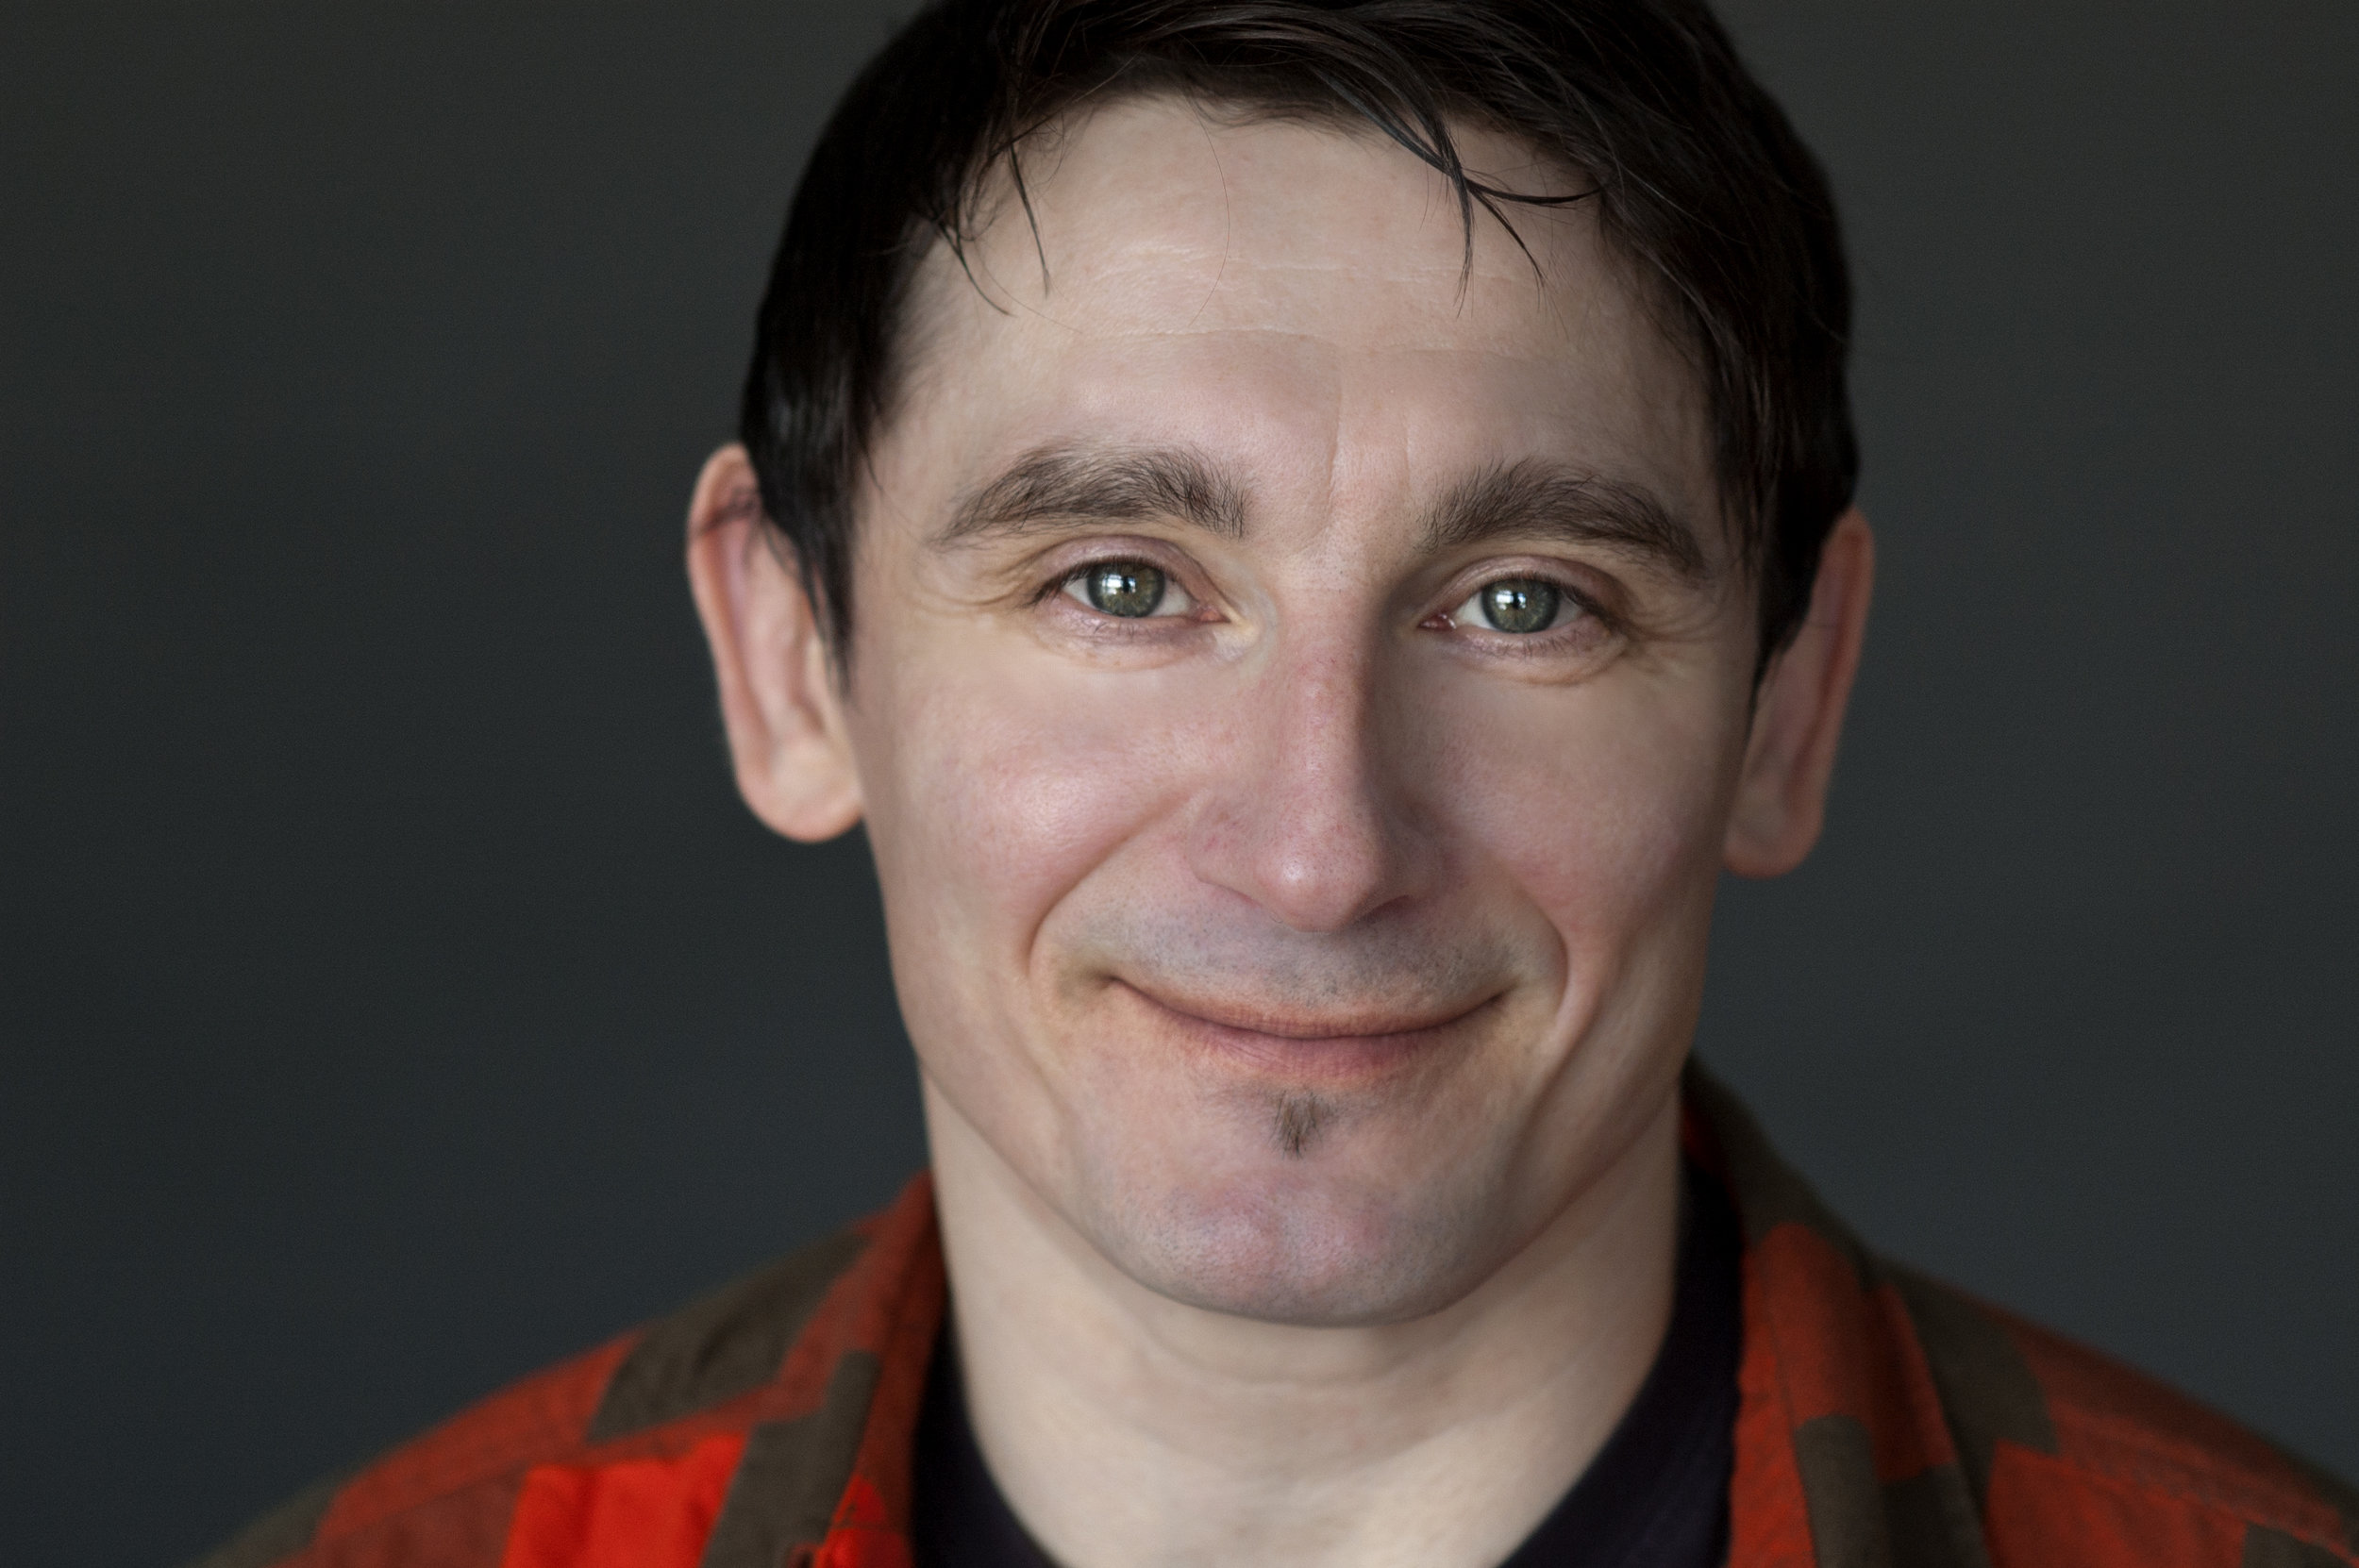 Marius Ostrowsky